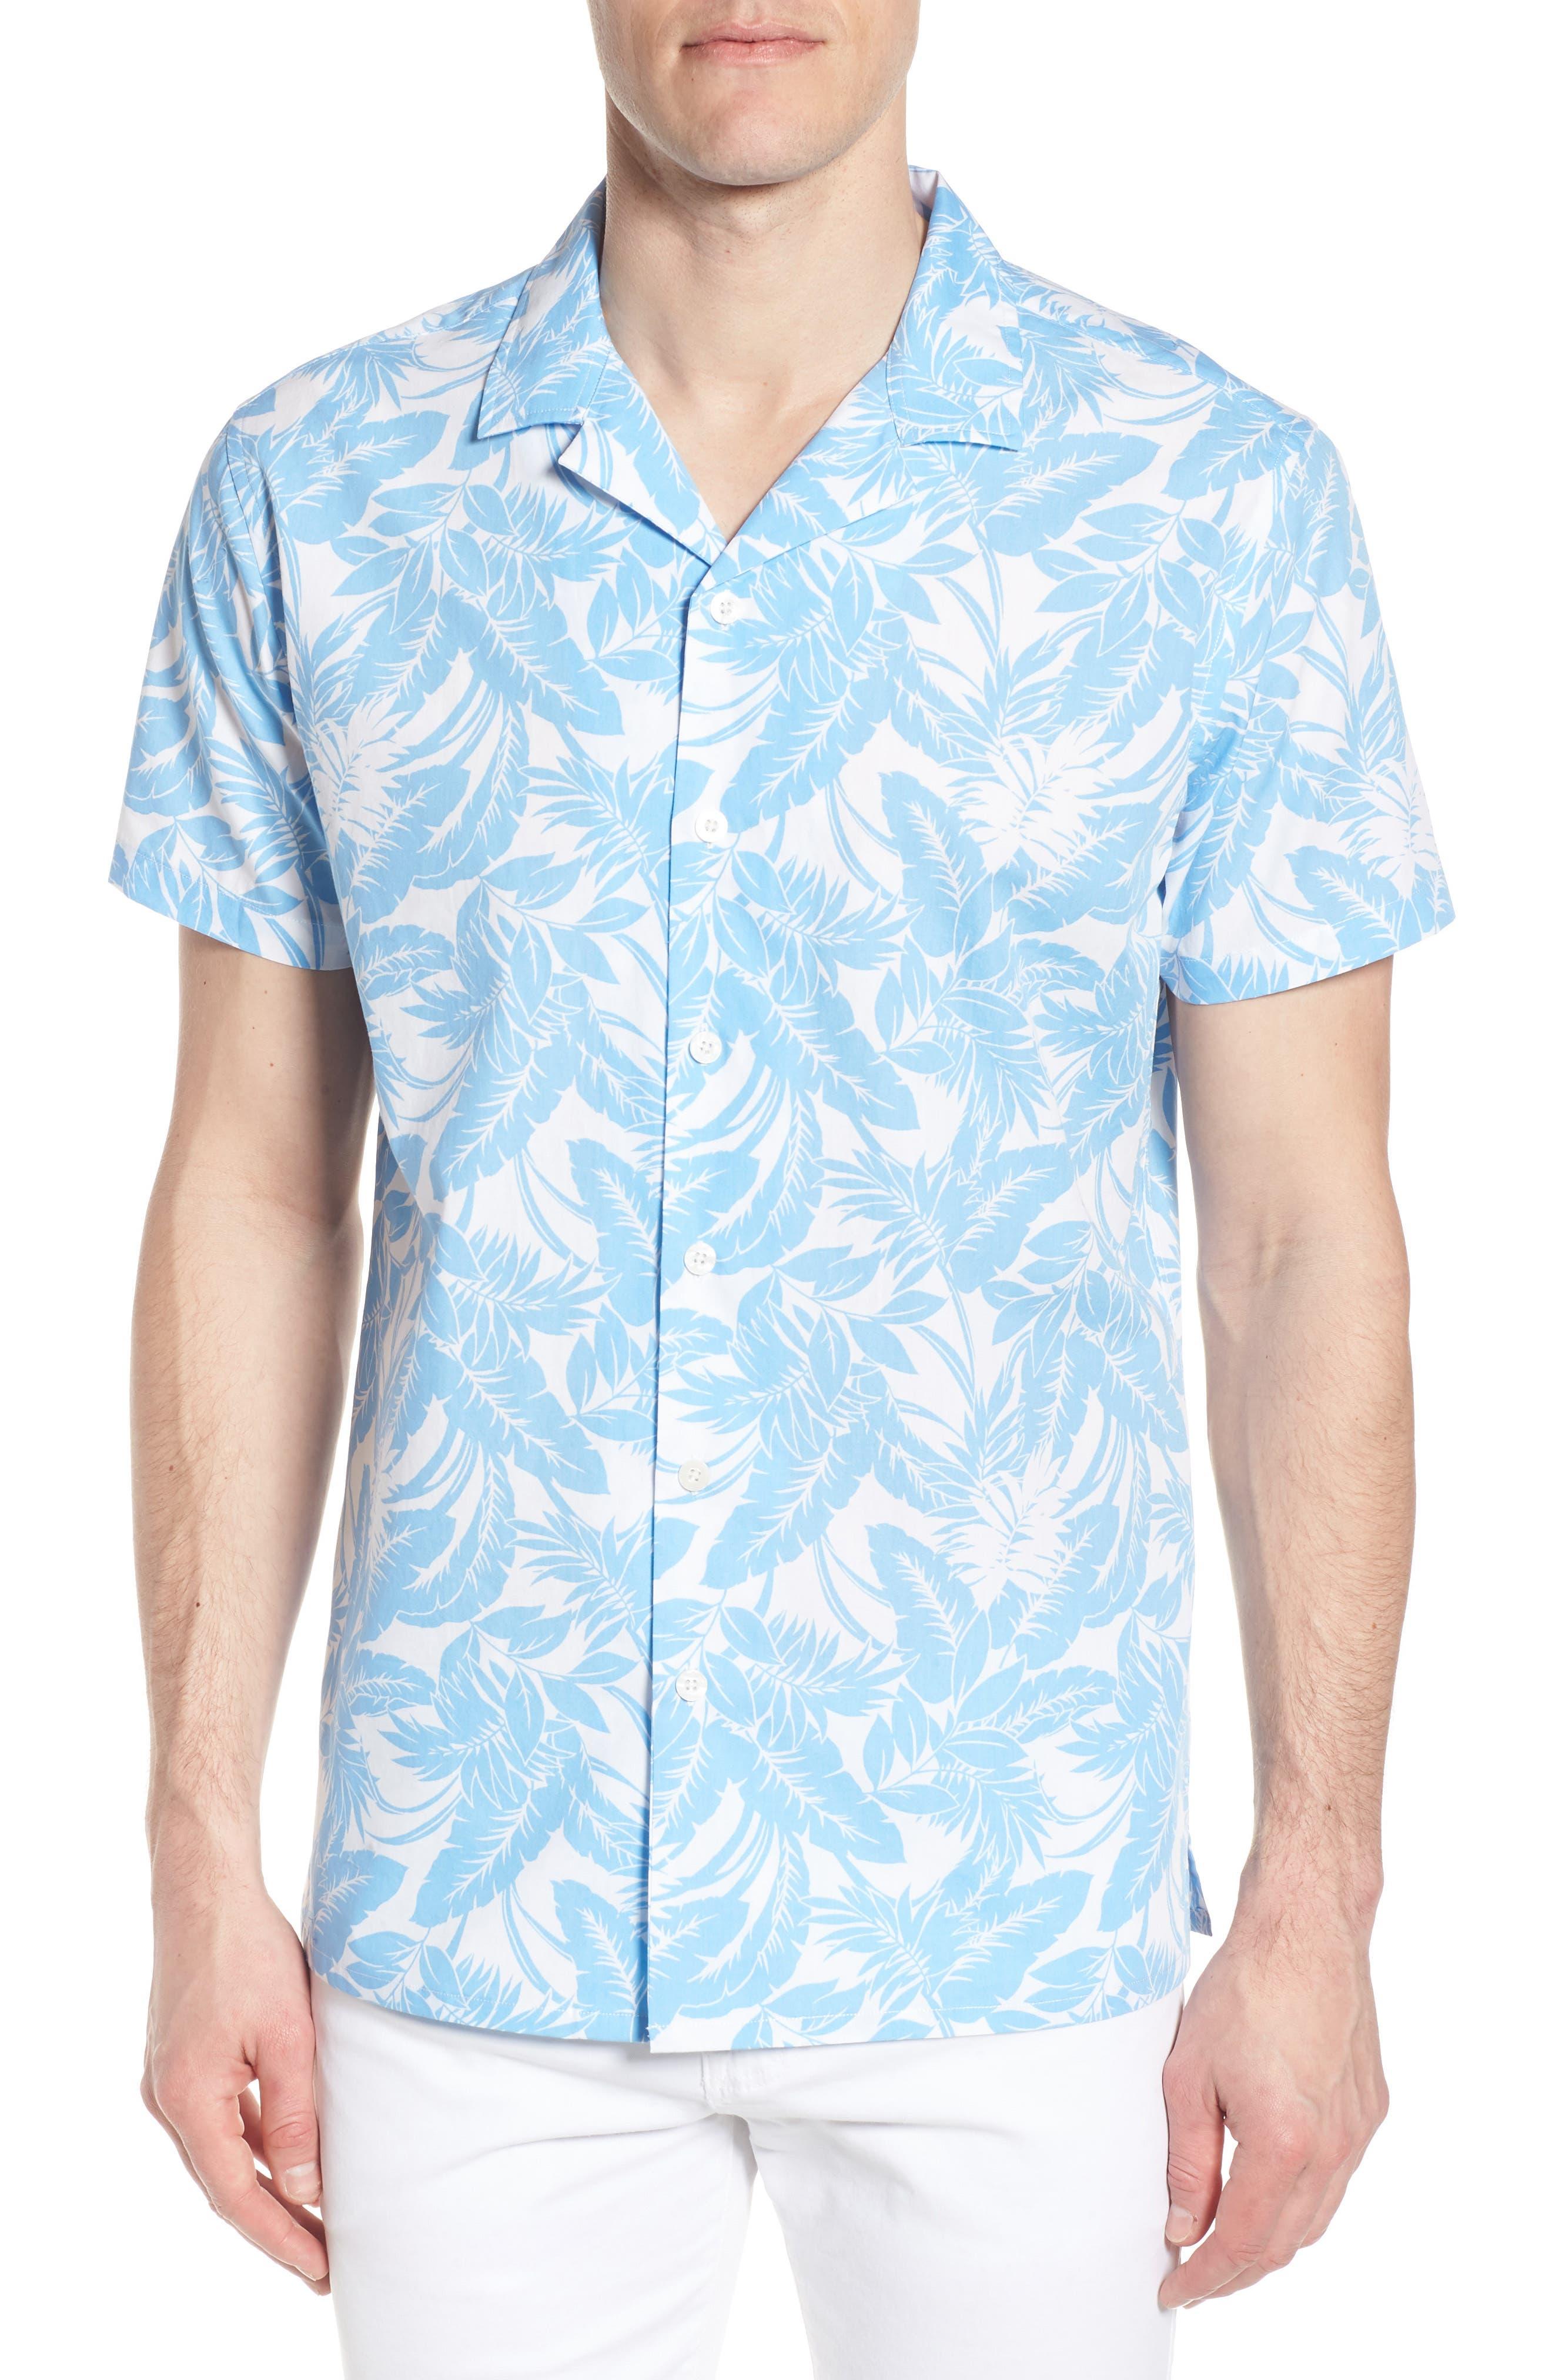 Camp Ventu Regular Fit Short Sleeve Sport Shirt,                             Main thumbnail 1, color,                             451